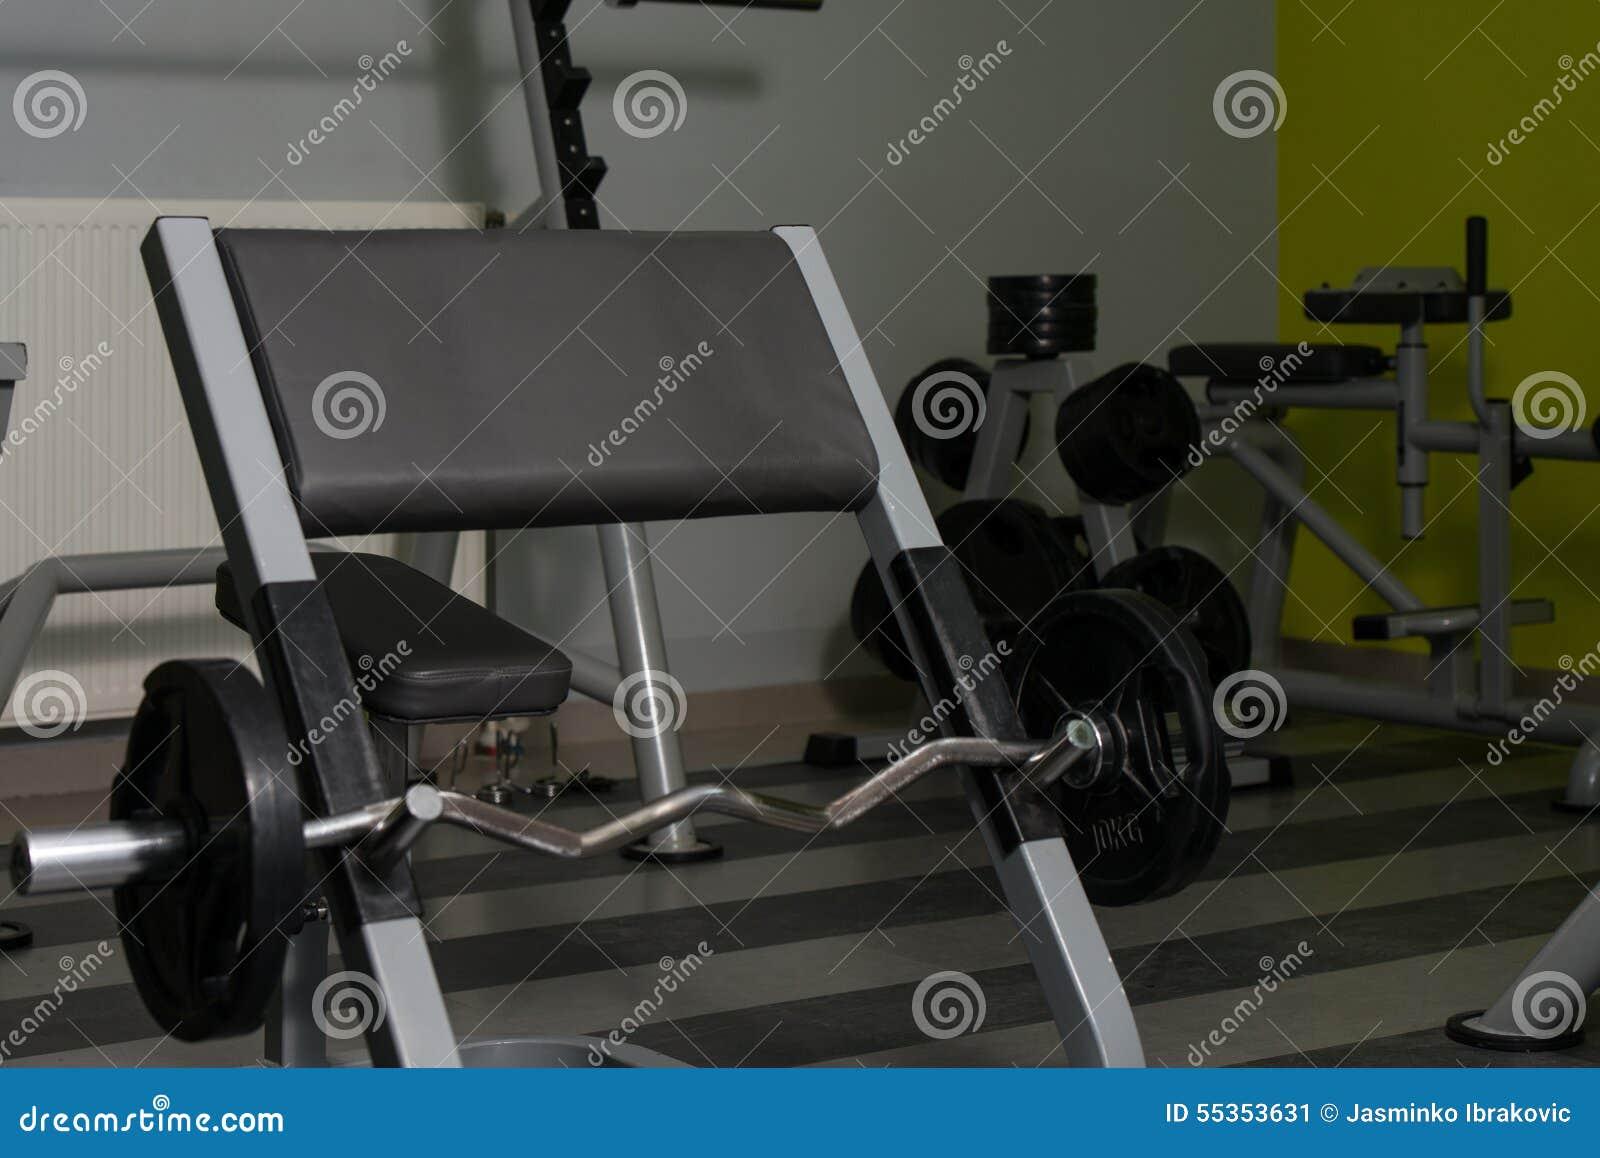 Bilanciere pronto all allenamento